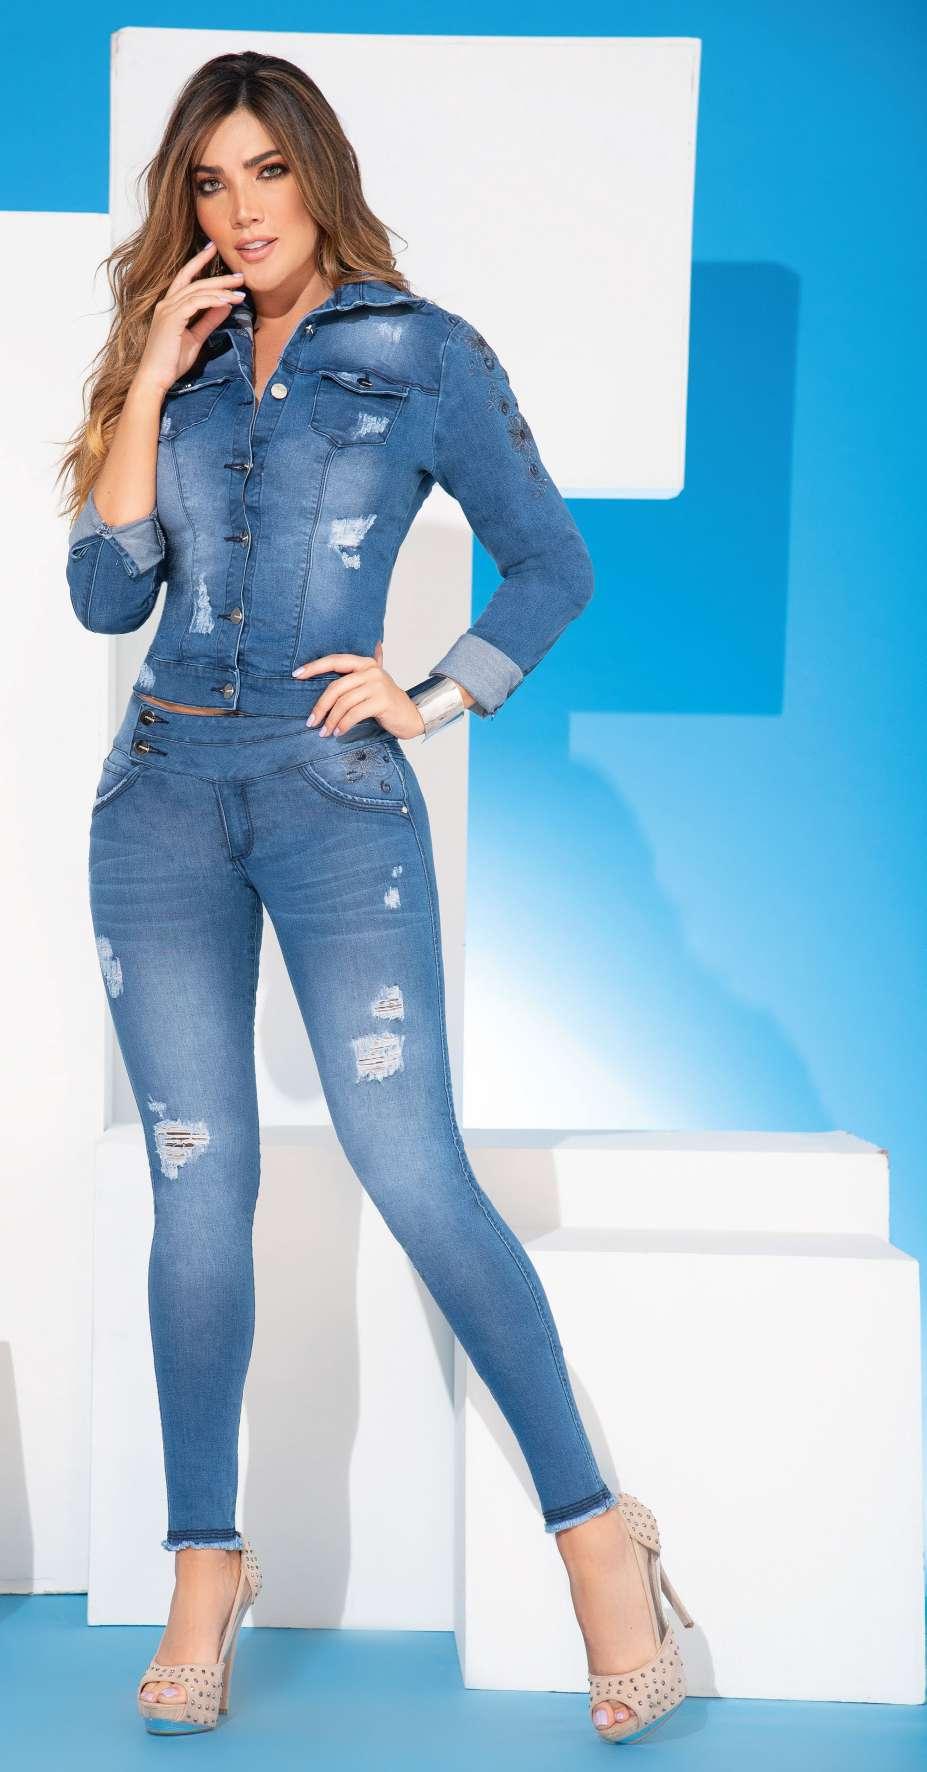 BJV jeans_Page_43_Image_0001